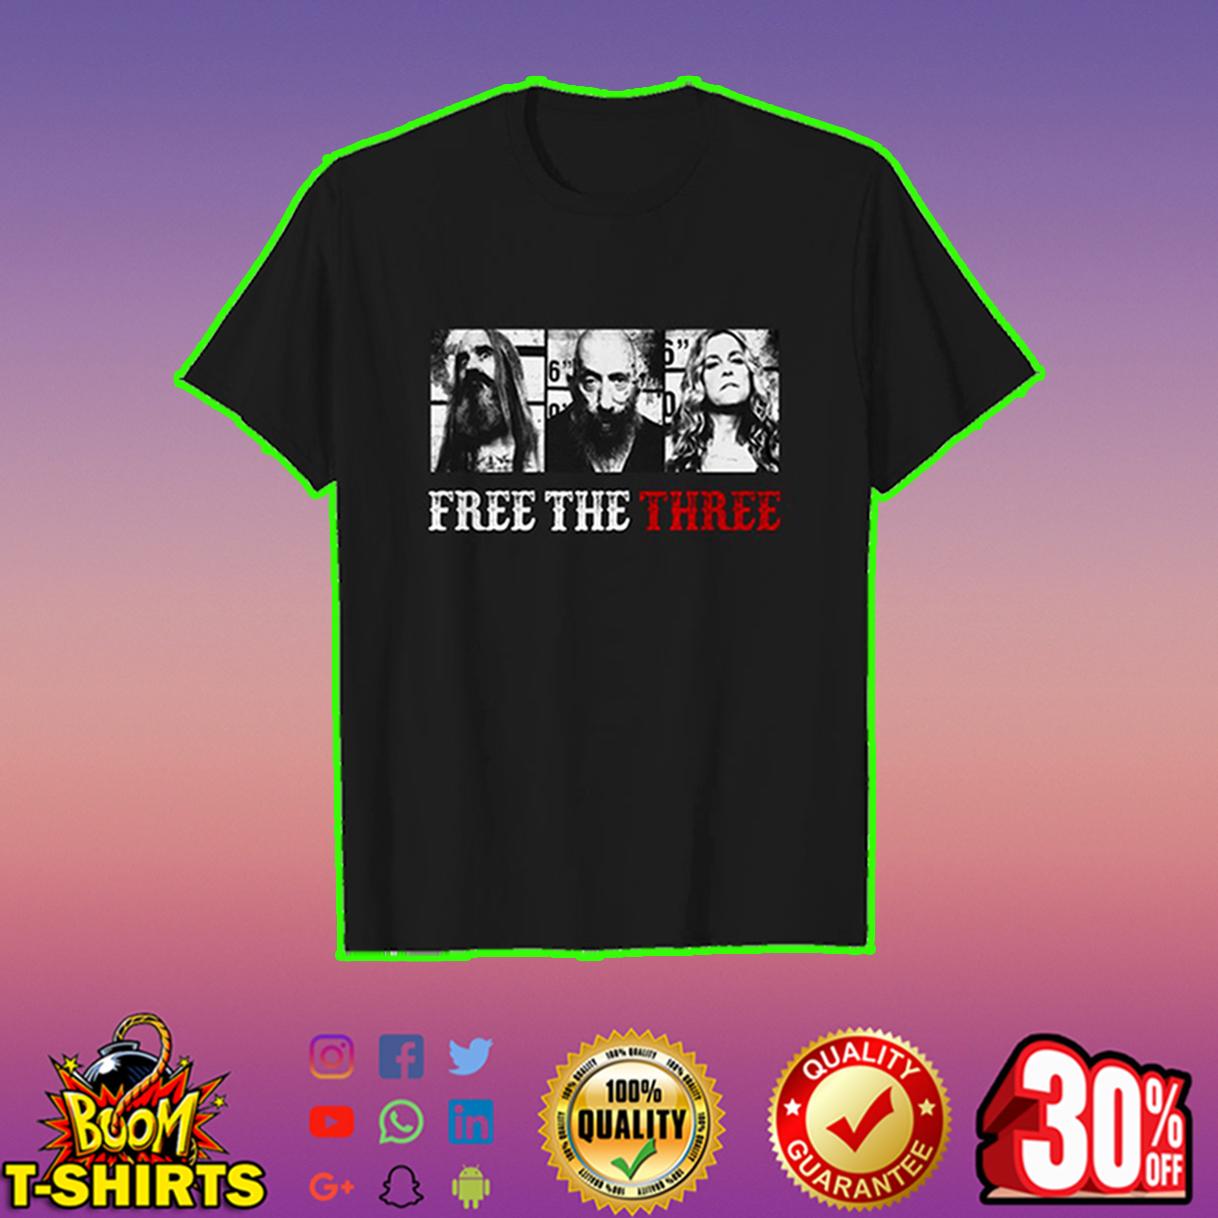 Free the three shirt